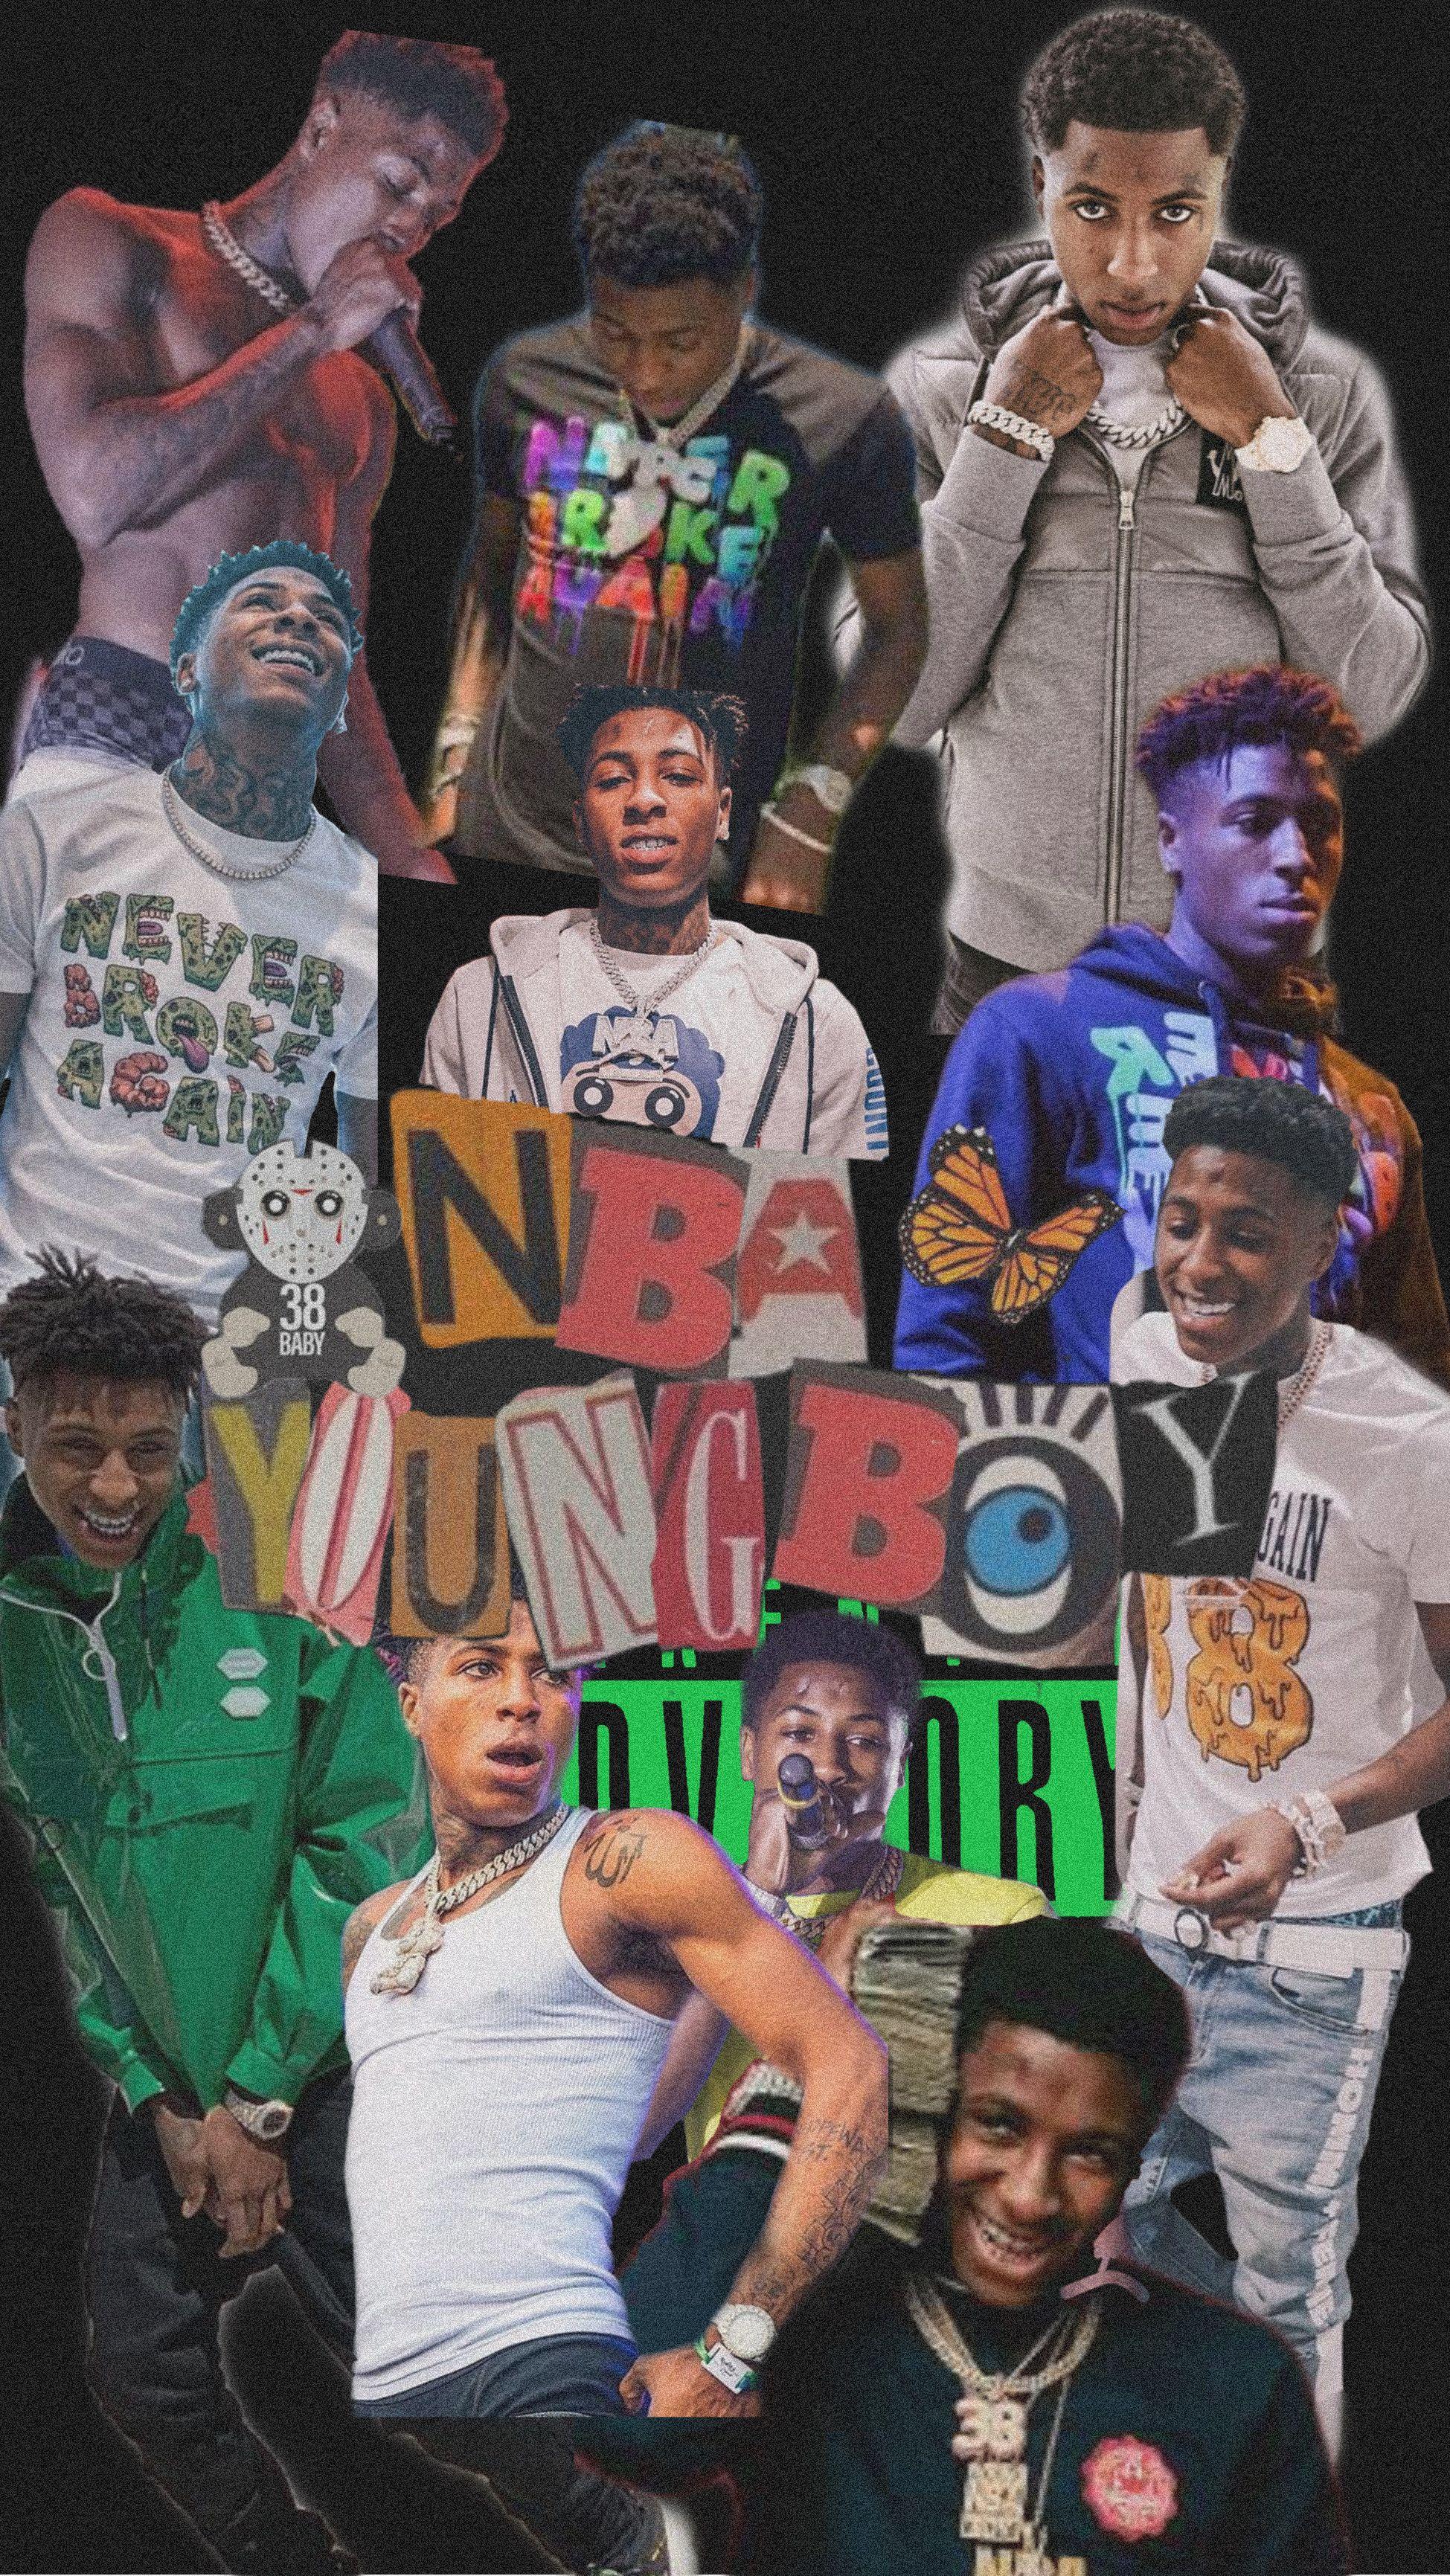 Nba Youngboy Lockscreen Nba Rapper Wallpaper Iphone Badass Wallpaper Iphone Cartoon Wallpaper Iphone